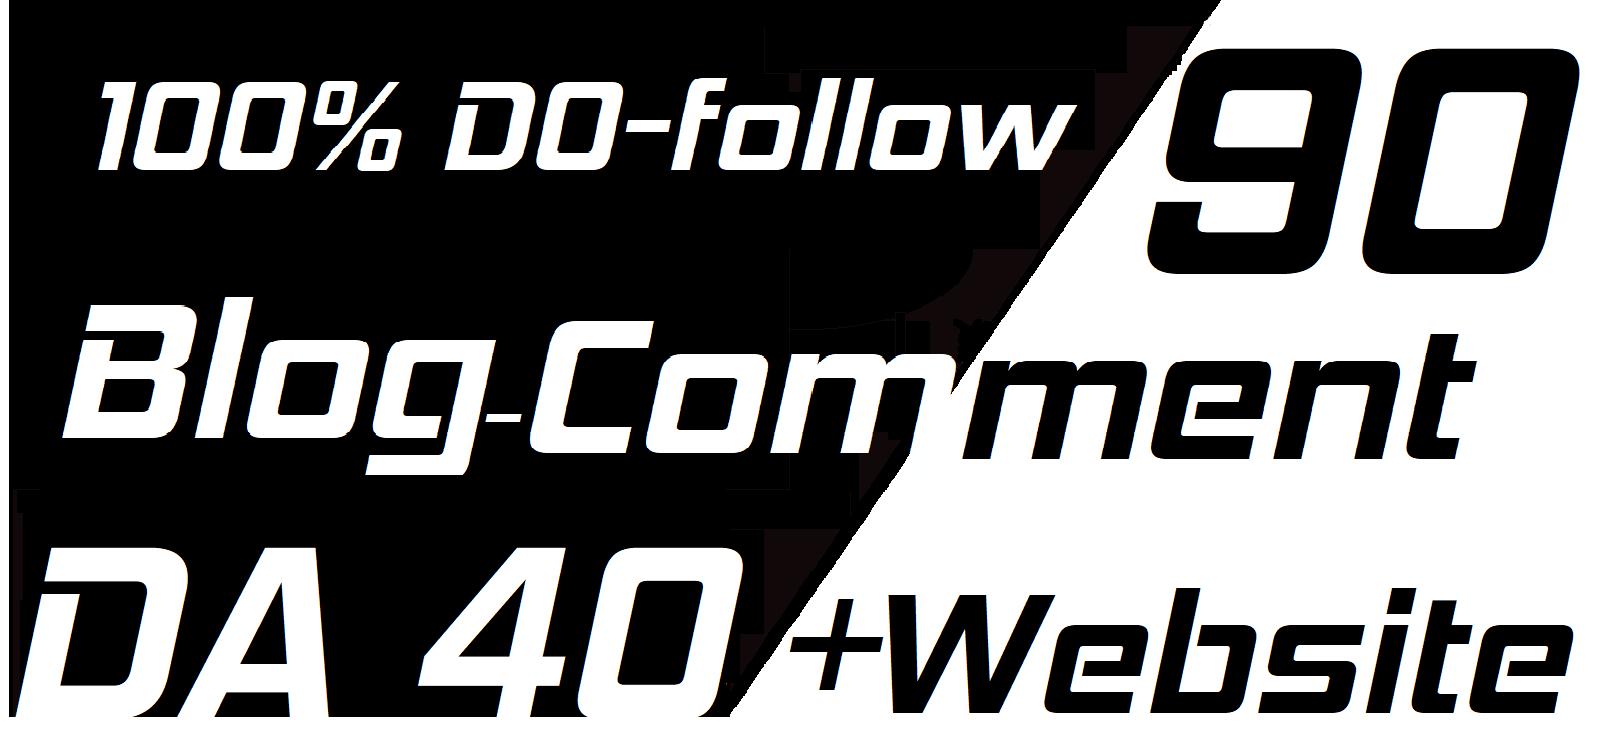 Create 90 Dofollow Blog Comments on DA 40+ websites